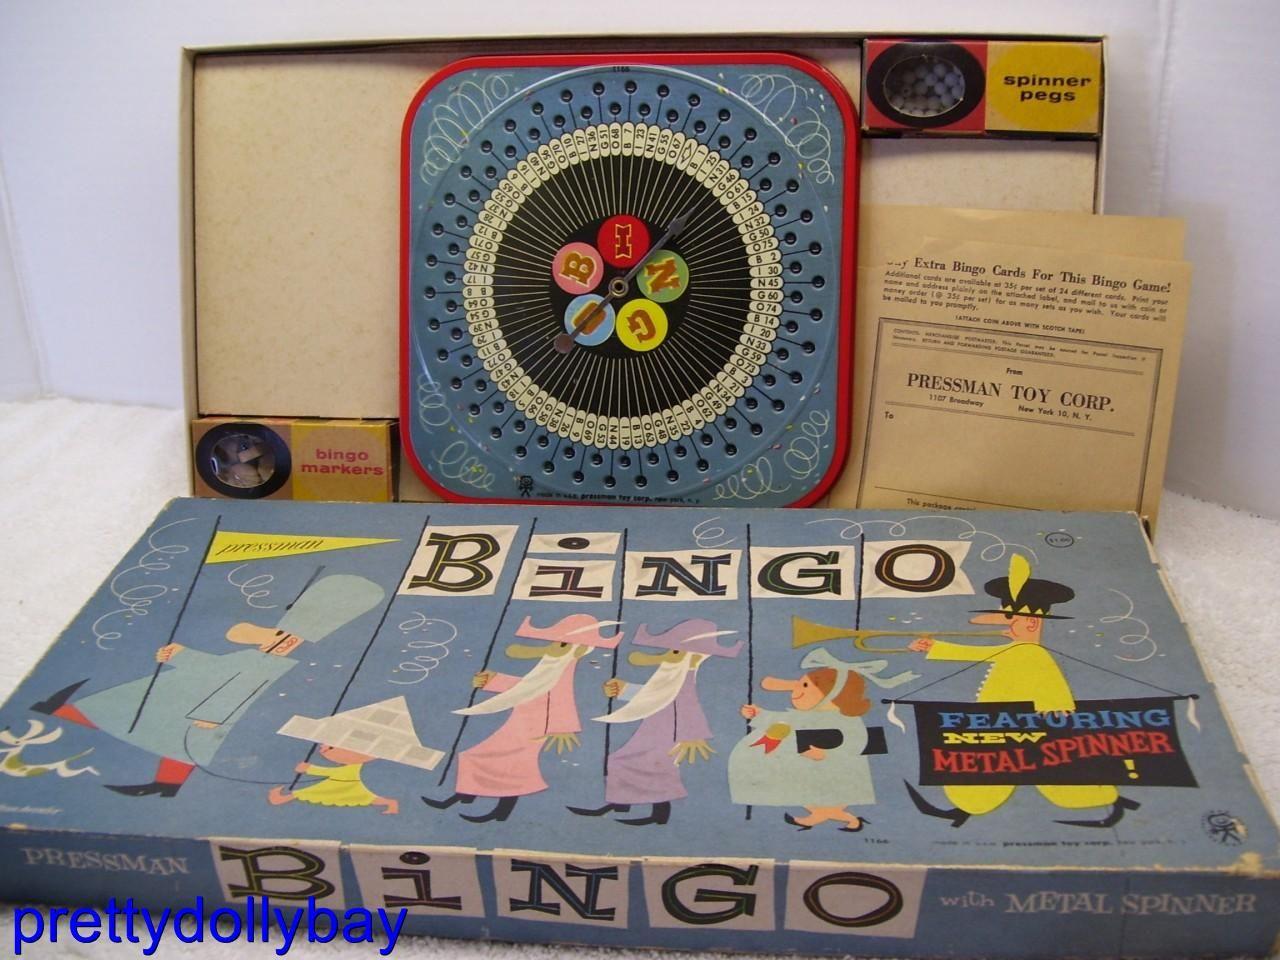 Image detail for -Vtg 60s Bingo Metal Spinner Board Game Pressman Toy NYC | eBay